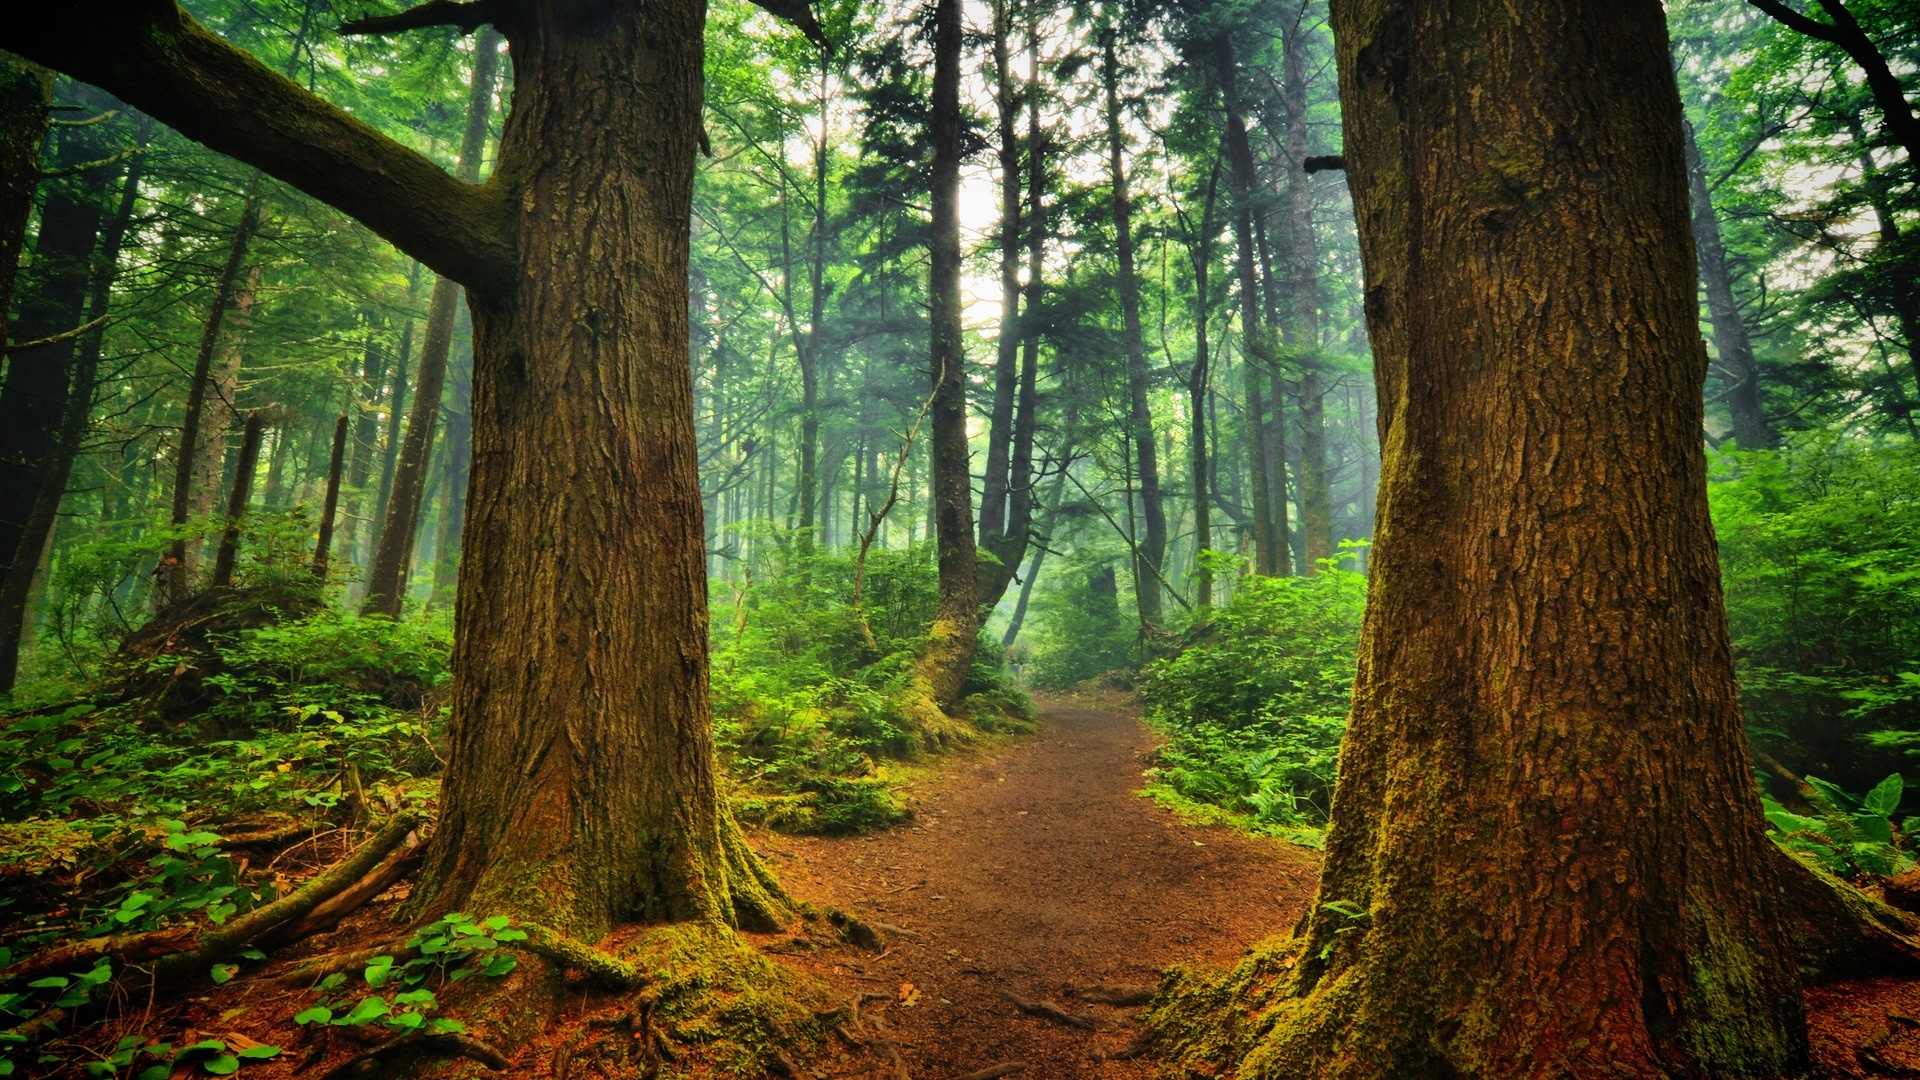 forest-path-wallpaper-32564-33311-hd-wallpapers.jpg